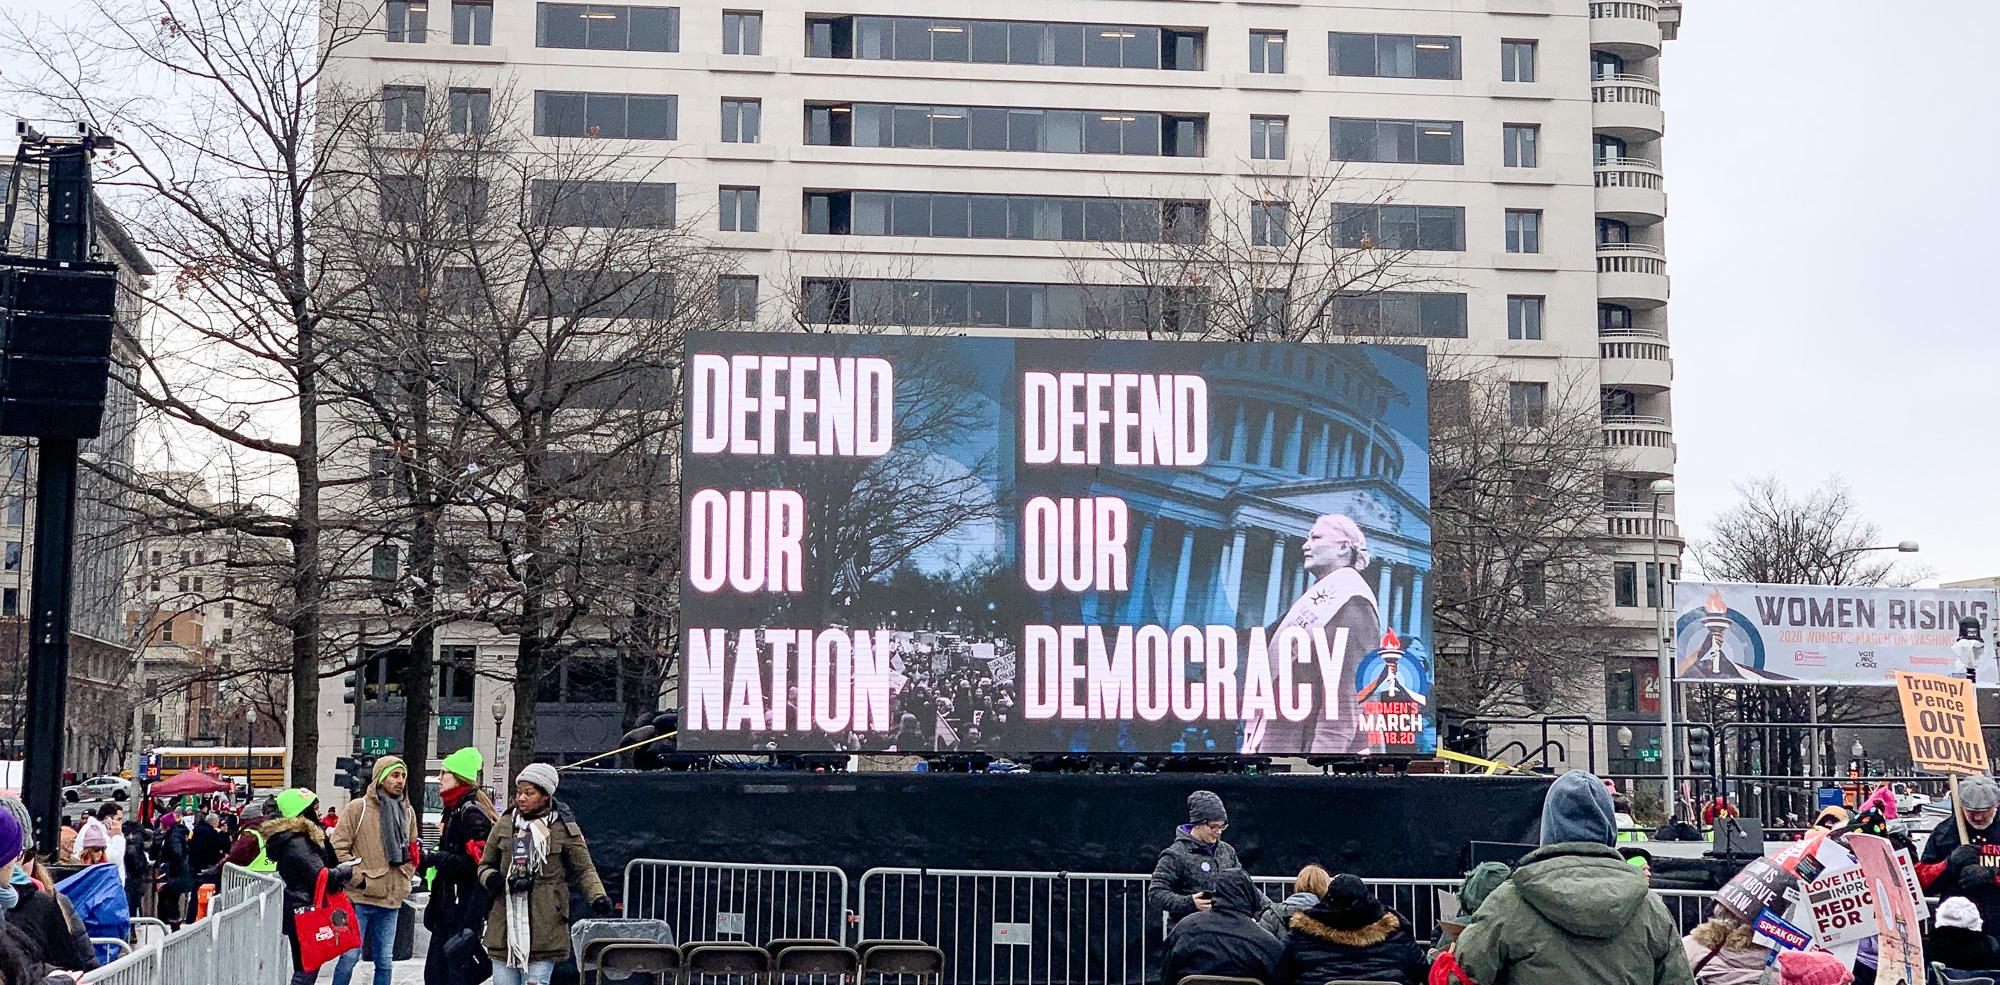 Women's March digital signage